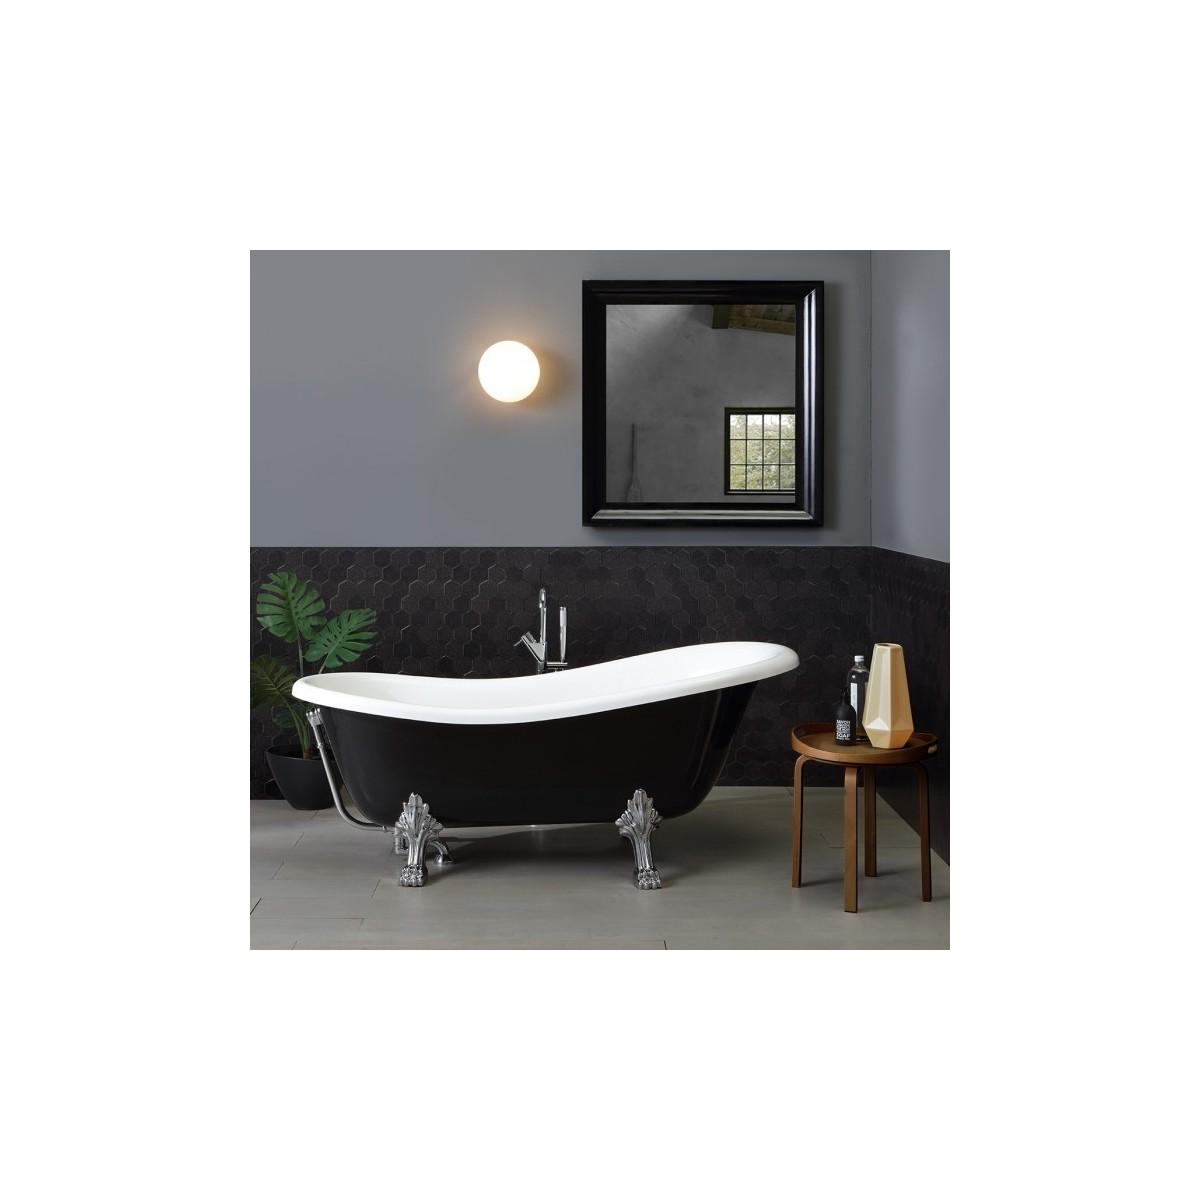 Vasca da bagno nera in stile retr con piedini cleopatra 167cm - Vasca da bagno retro ...